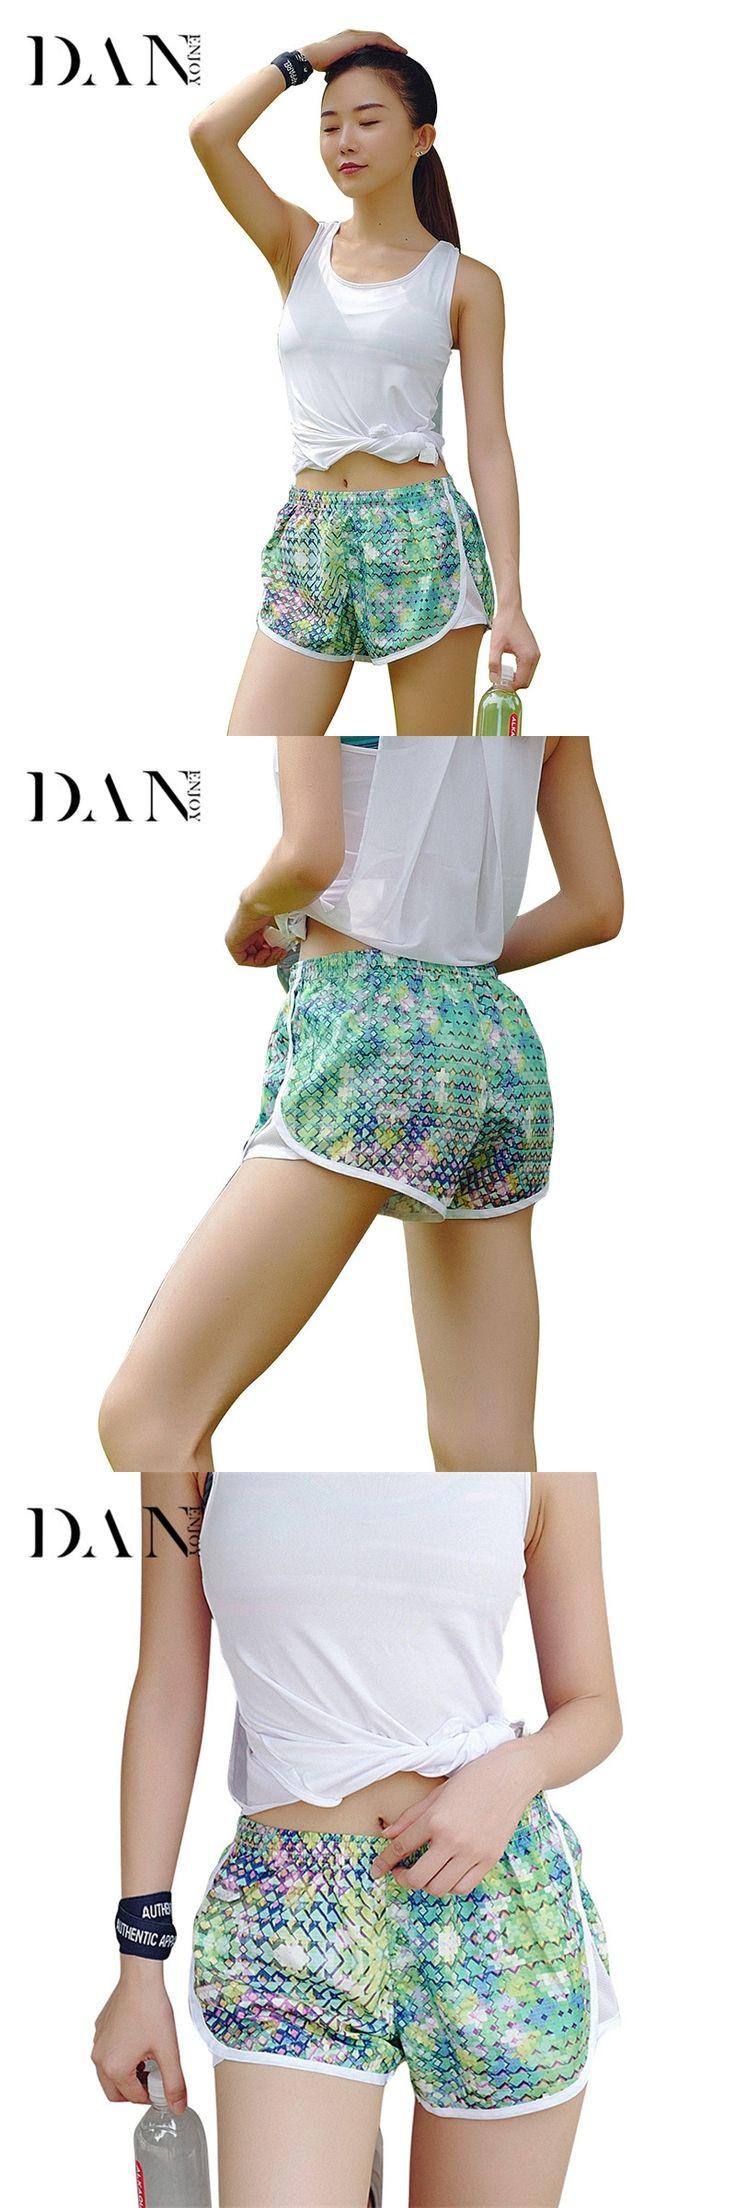 DANENJOY Sports Shorts Mesh Cover Geometric Mesh Splicing Fitness Breathable Running Women Yoga Jogging Fake Two Piece Short